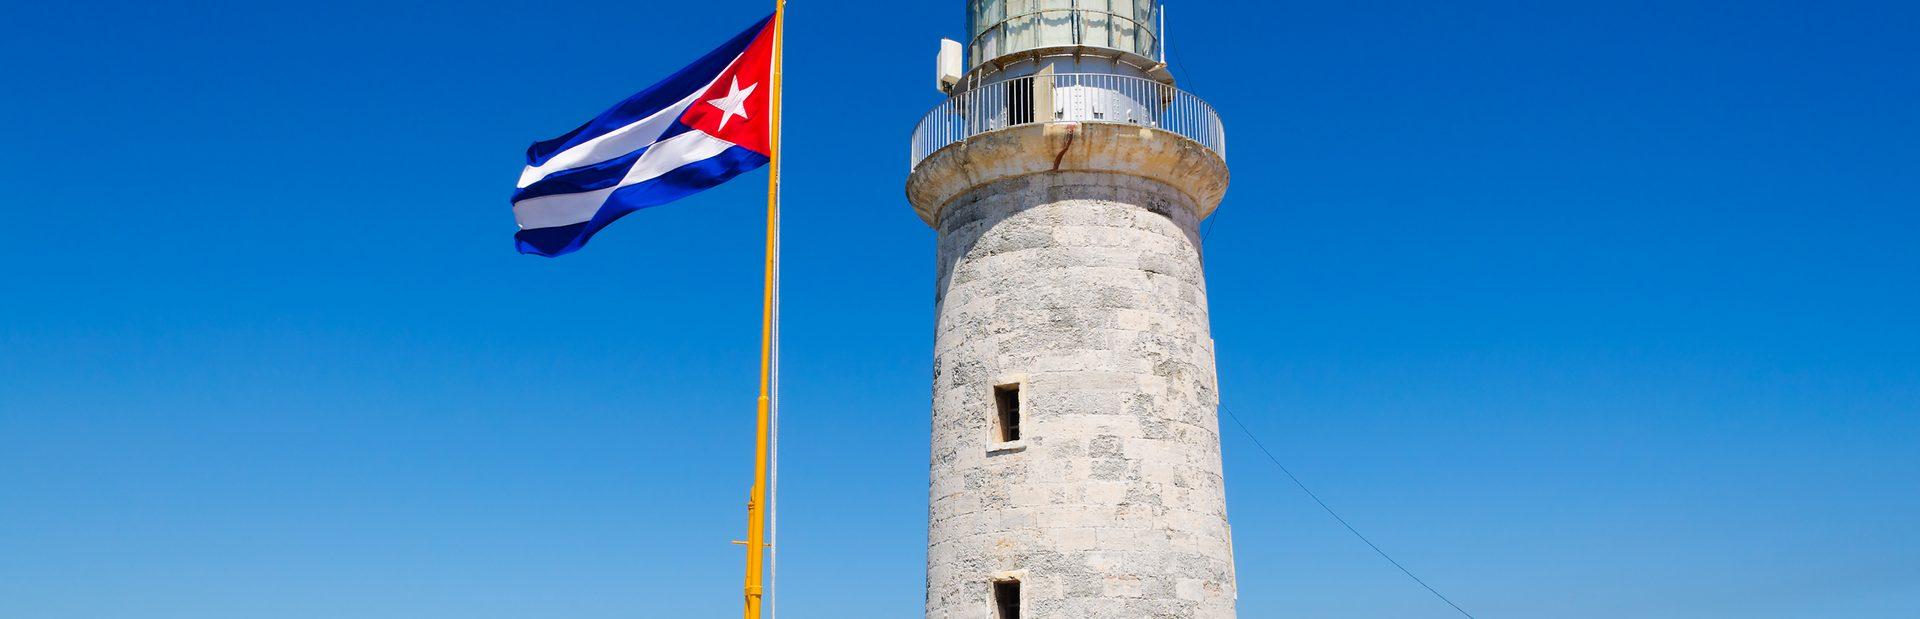 Waving Cuba flag next to the el Morro lighthouse